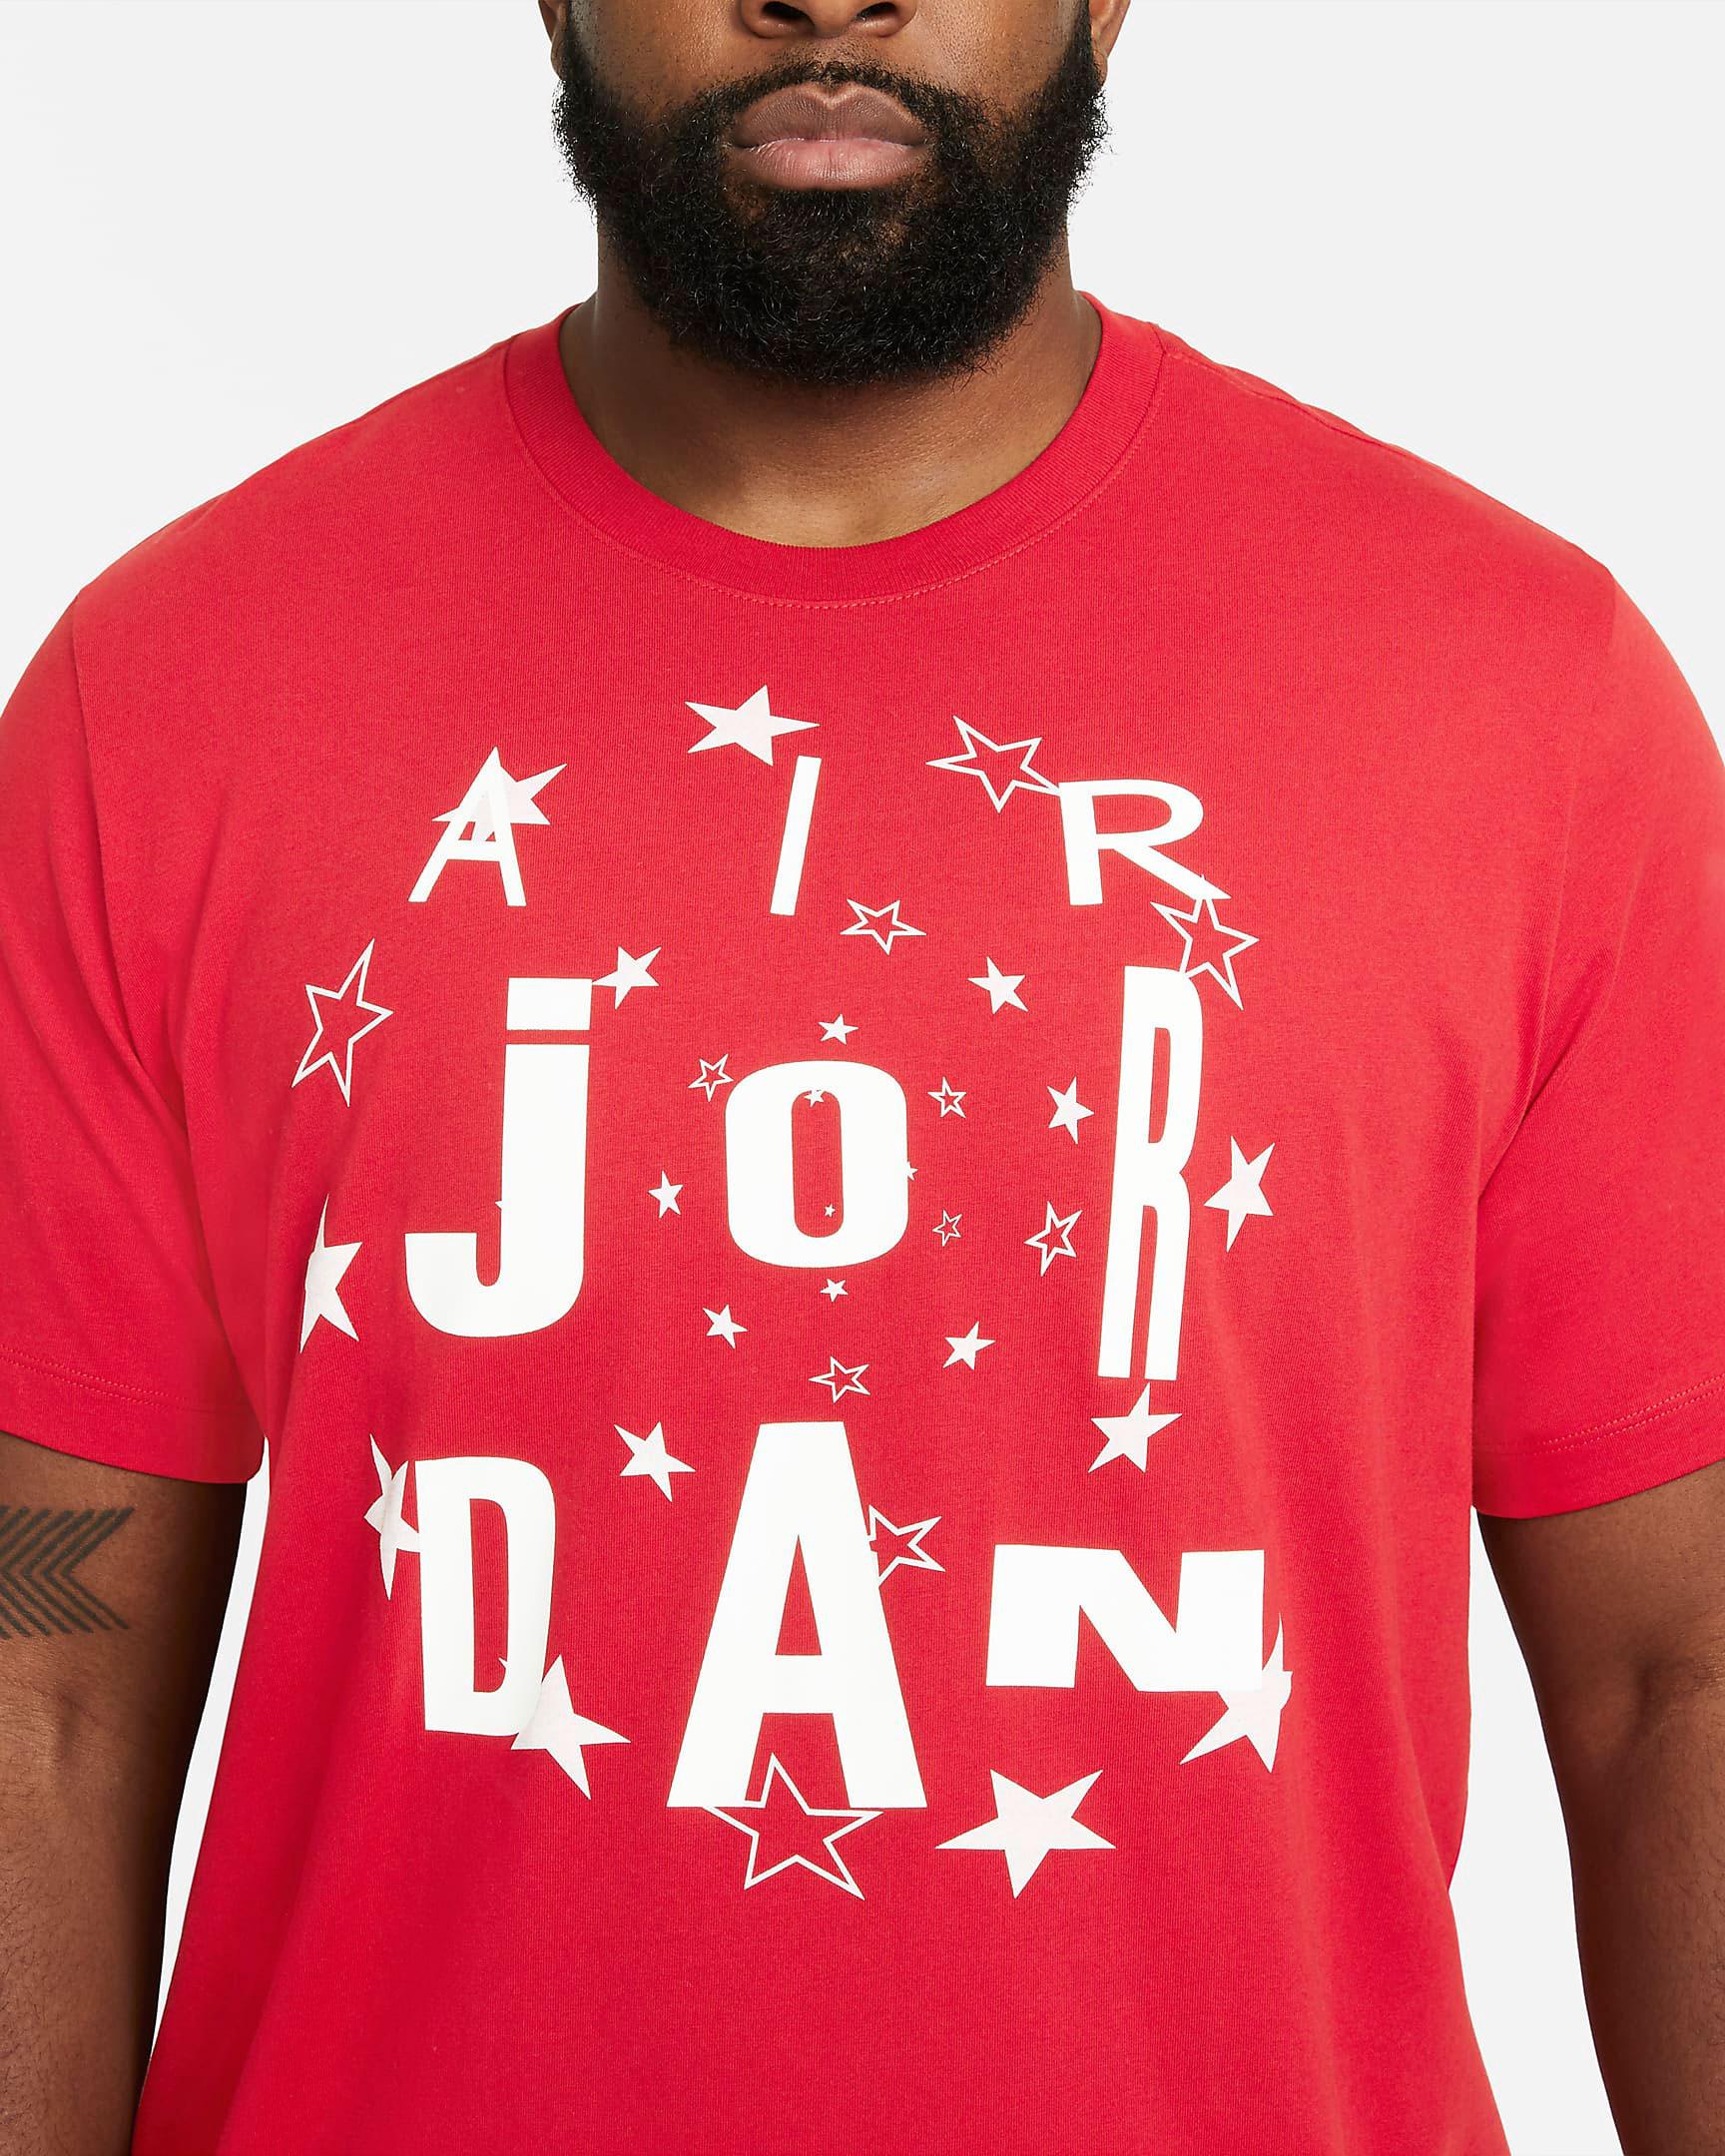 carmine-air-jordan-6-2021-t-shirt-2